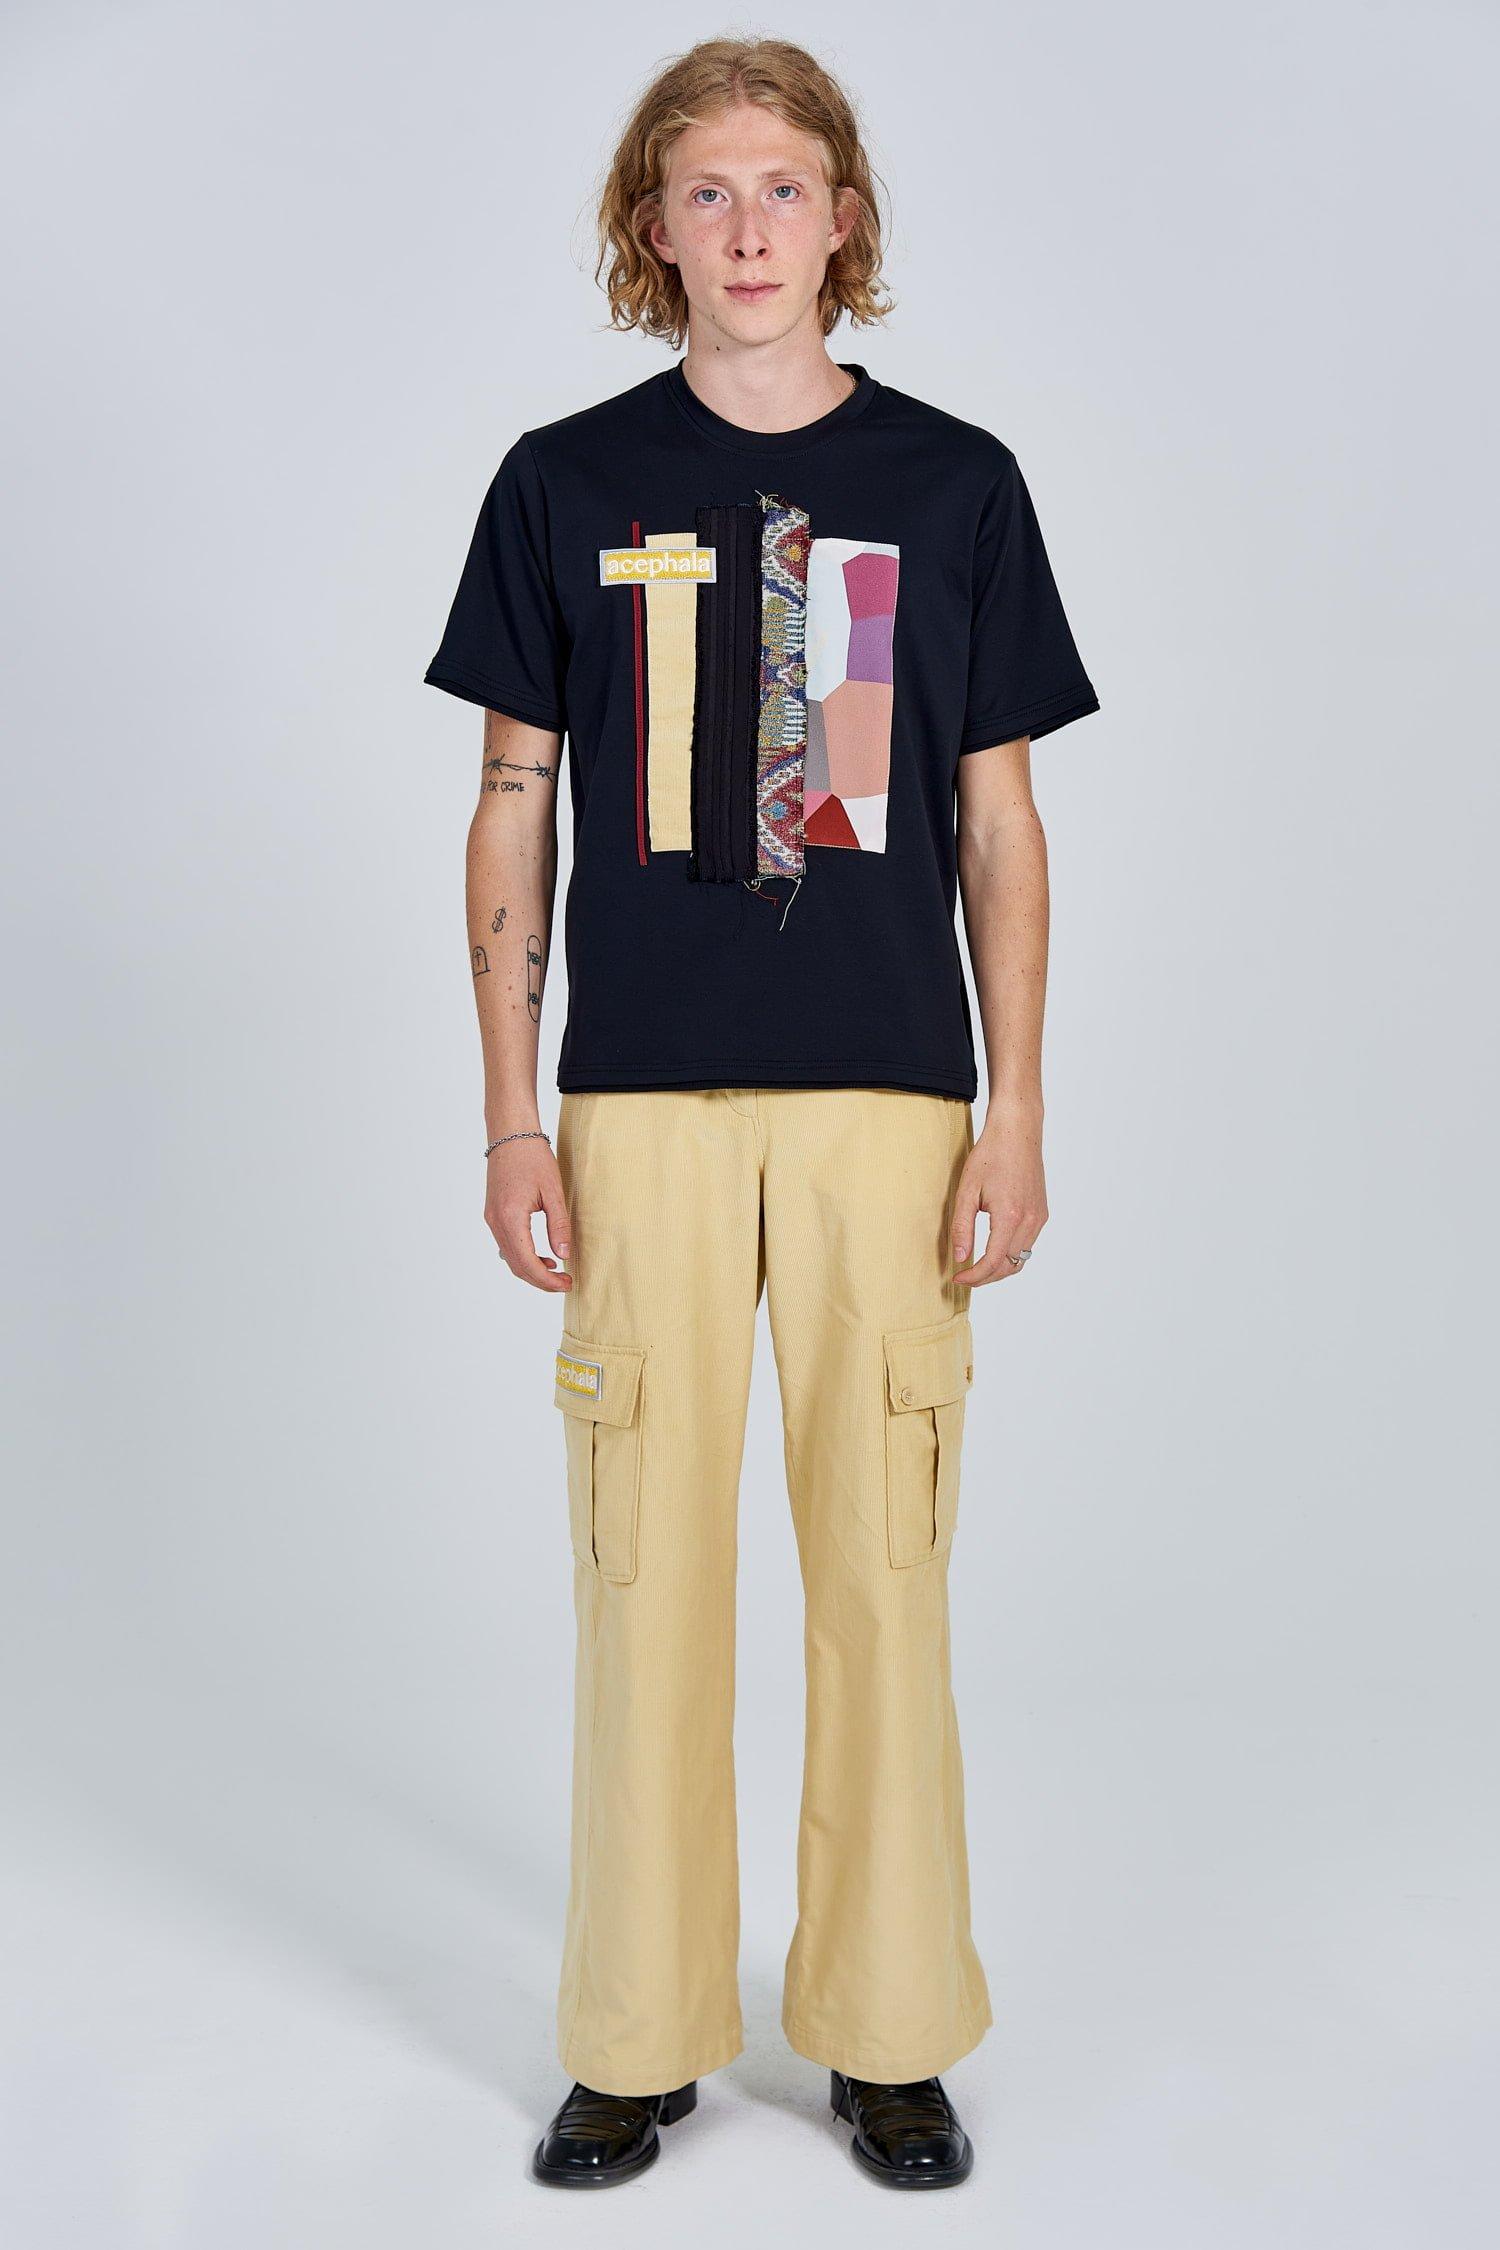 Acephala Fw 2020 21 Patchwork T Shirt Yellow Corduroy Trousers